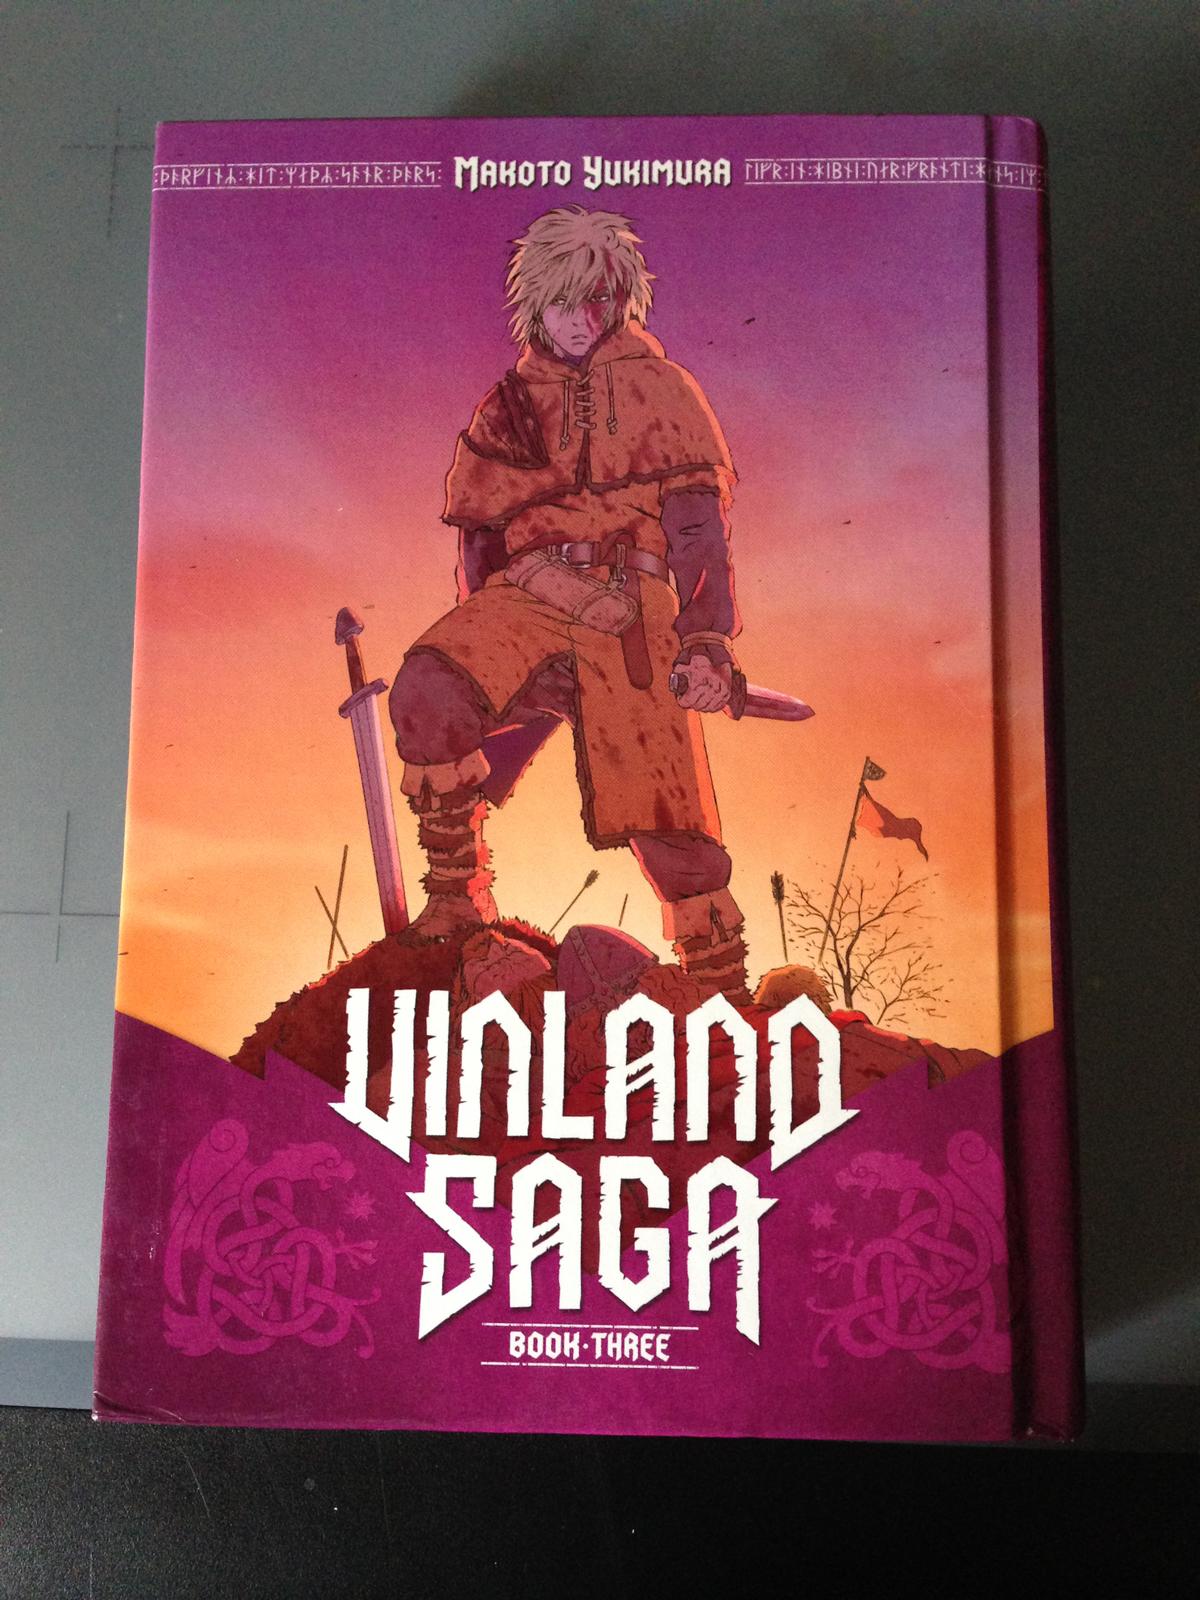 Vinland-saga-book-3